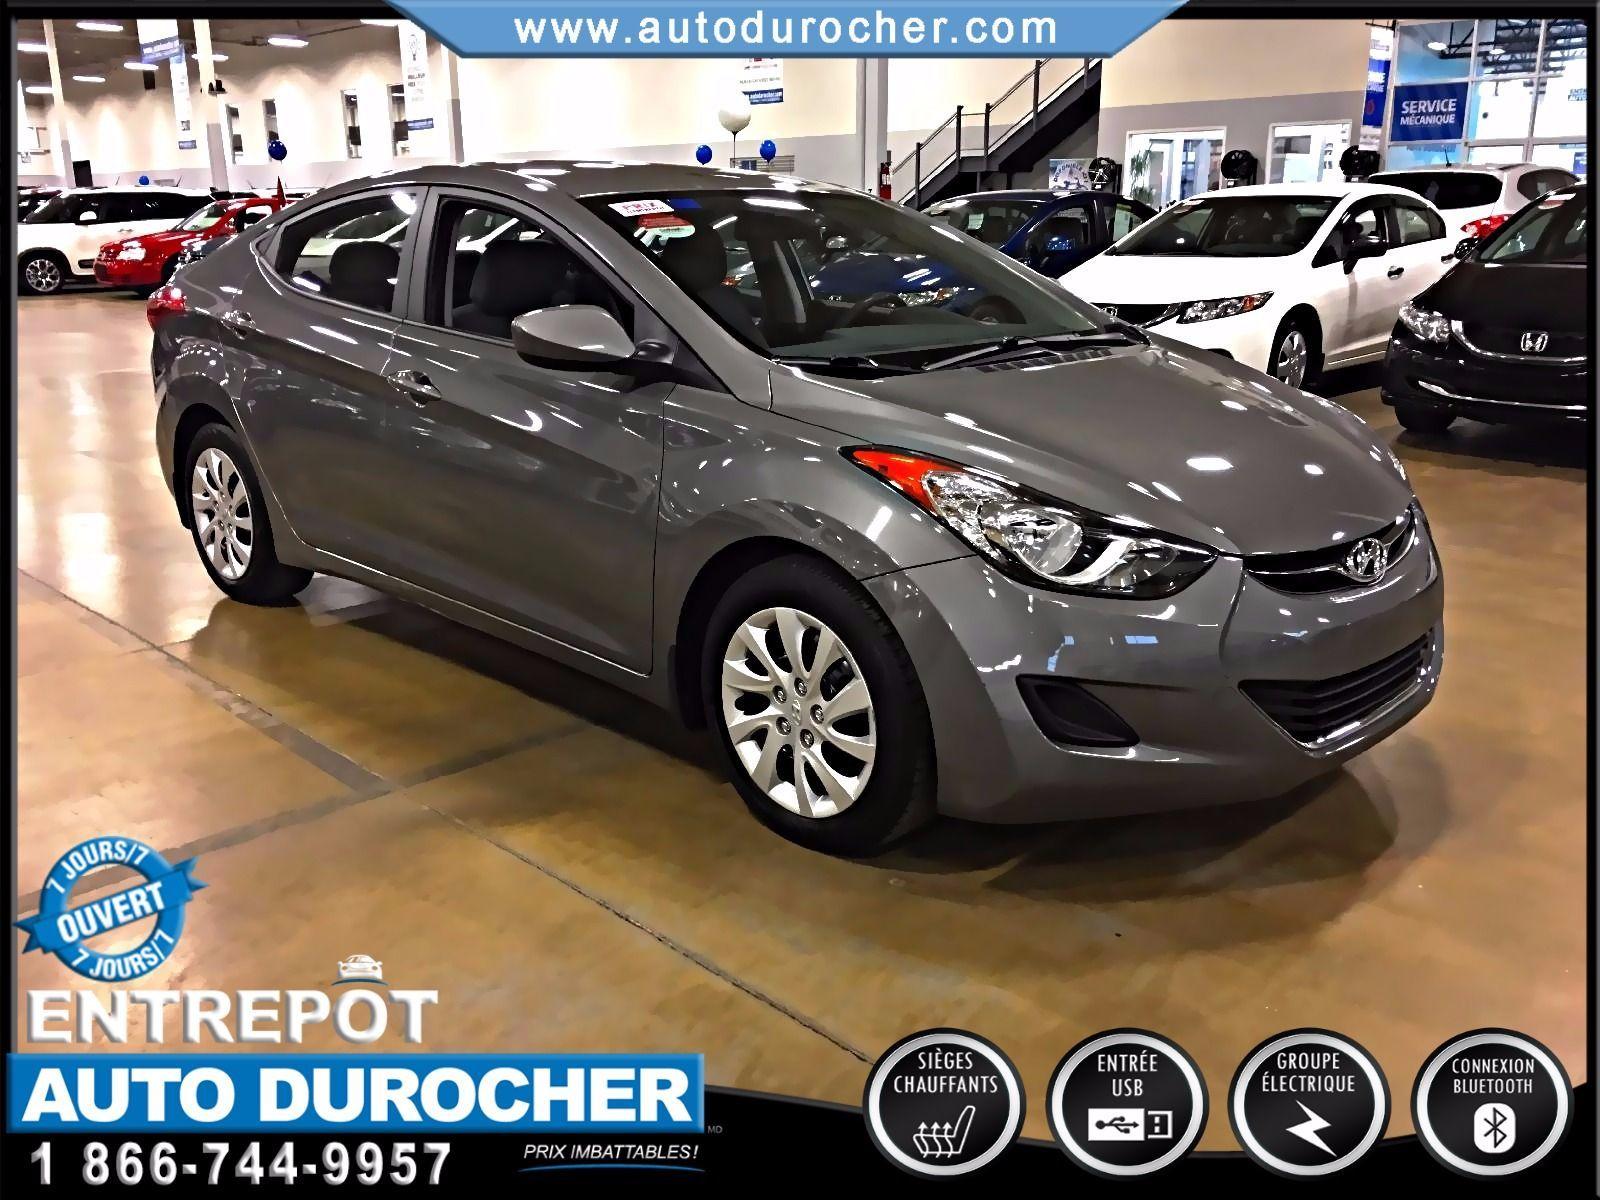 2013 Hyundai Elantra AUTOMATIQUE TOUT ÉQUIPÉ BLUETOOTH